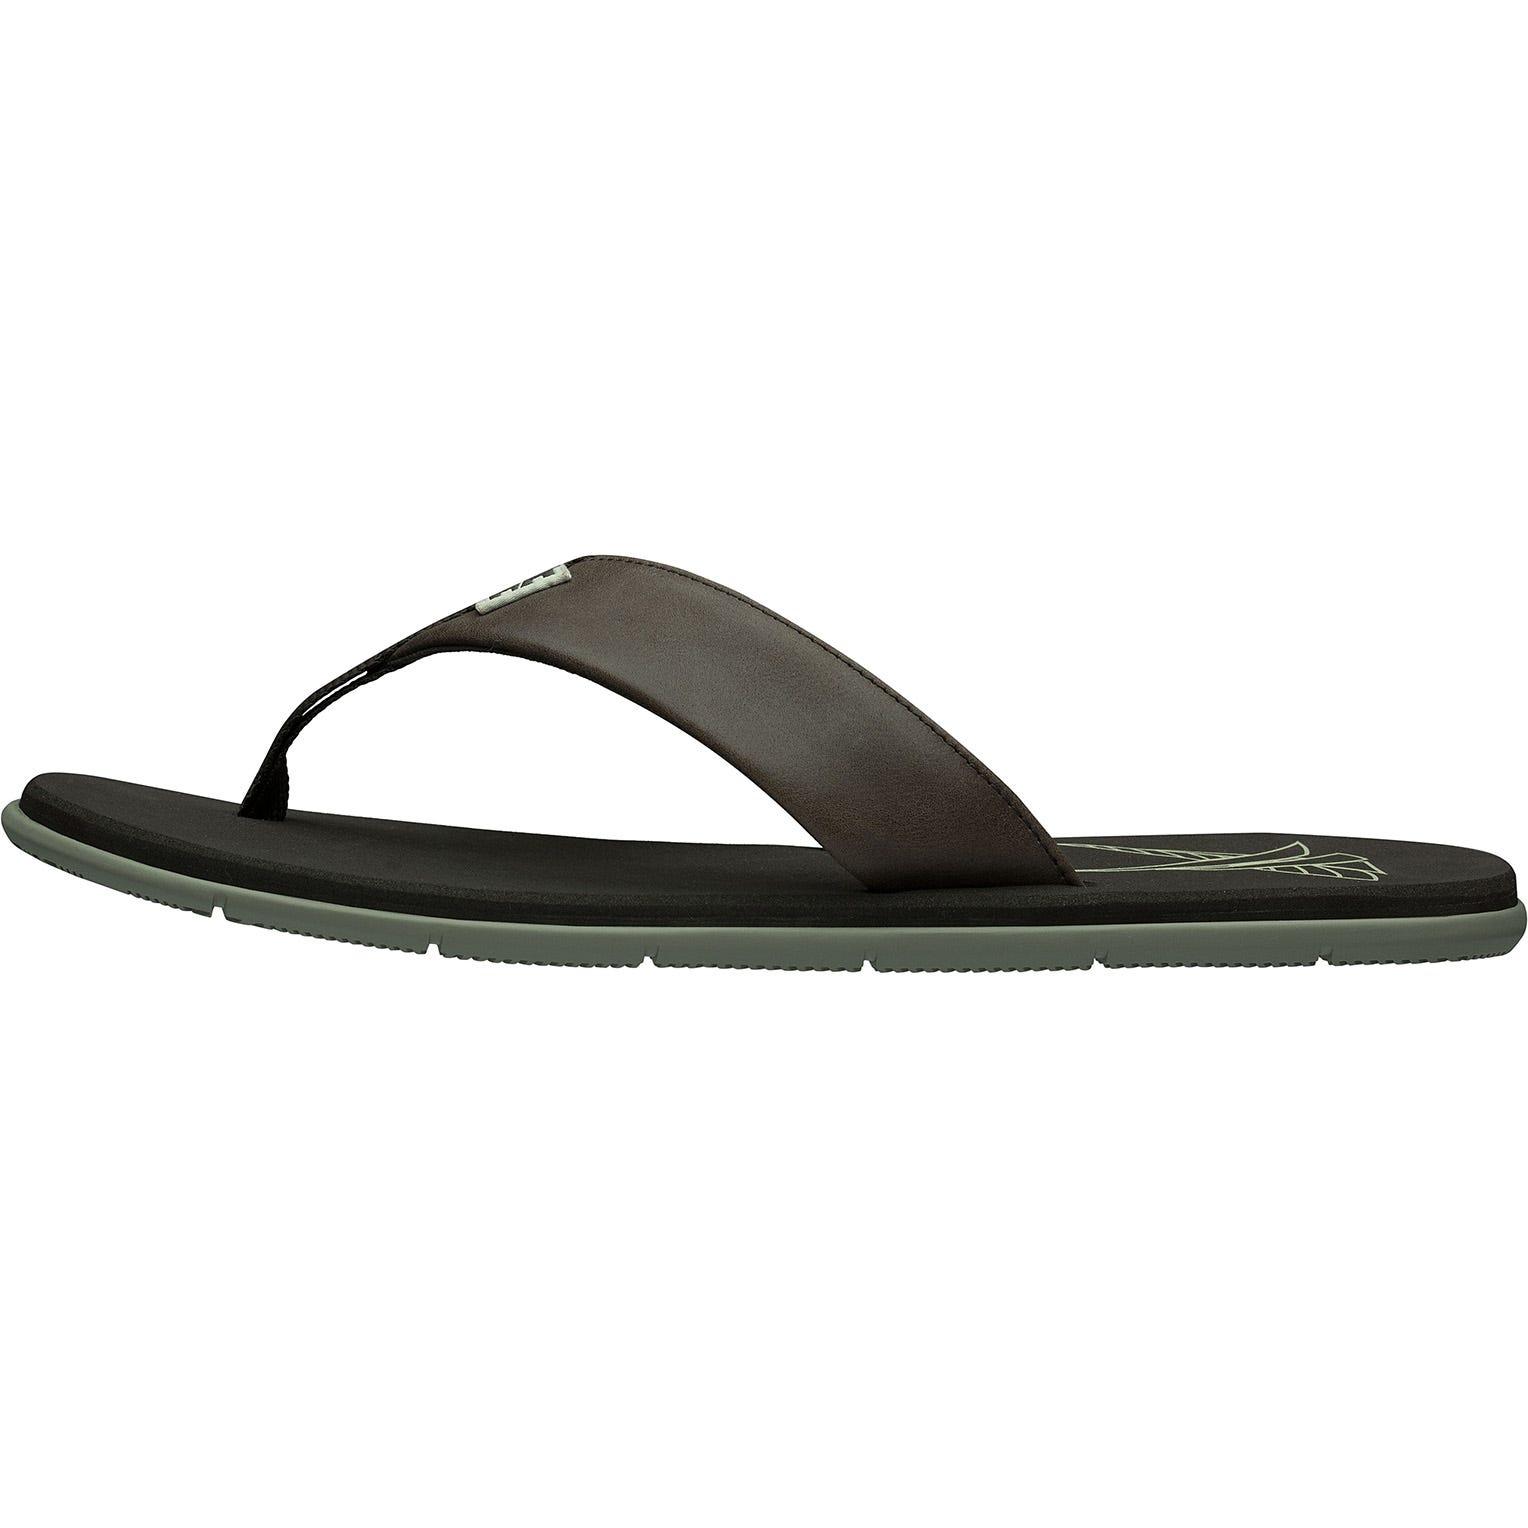 Helly Hansen Seasand Leather Sandal Mens Brown 42.5/9